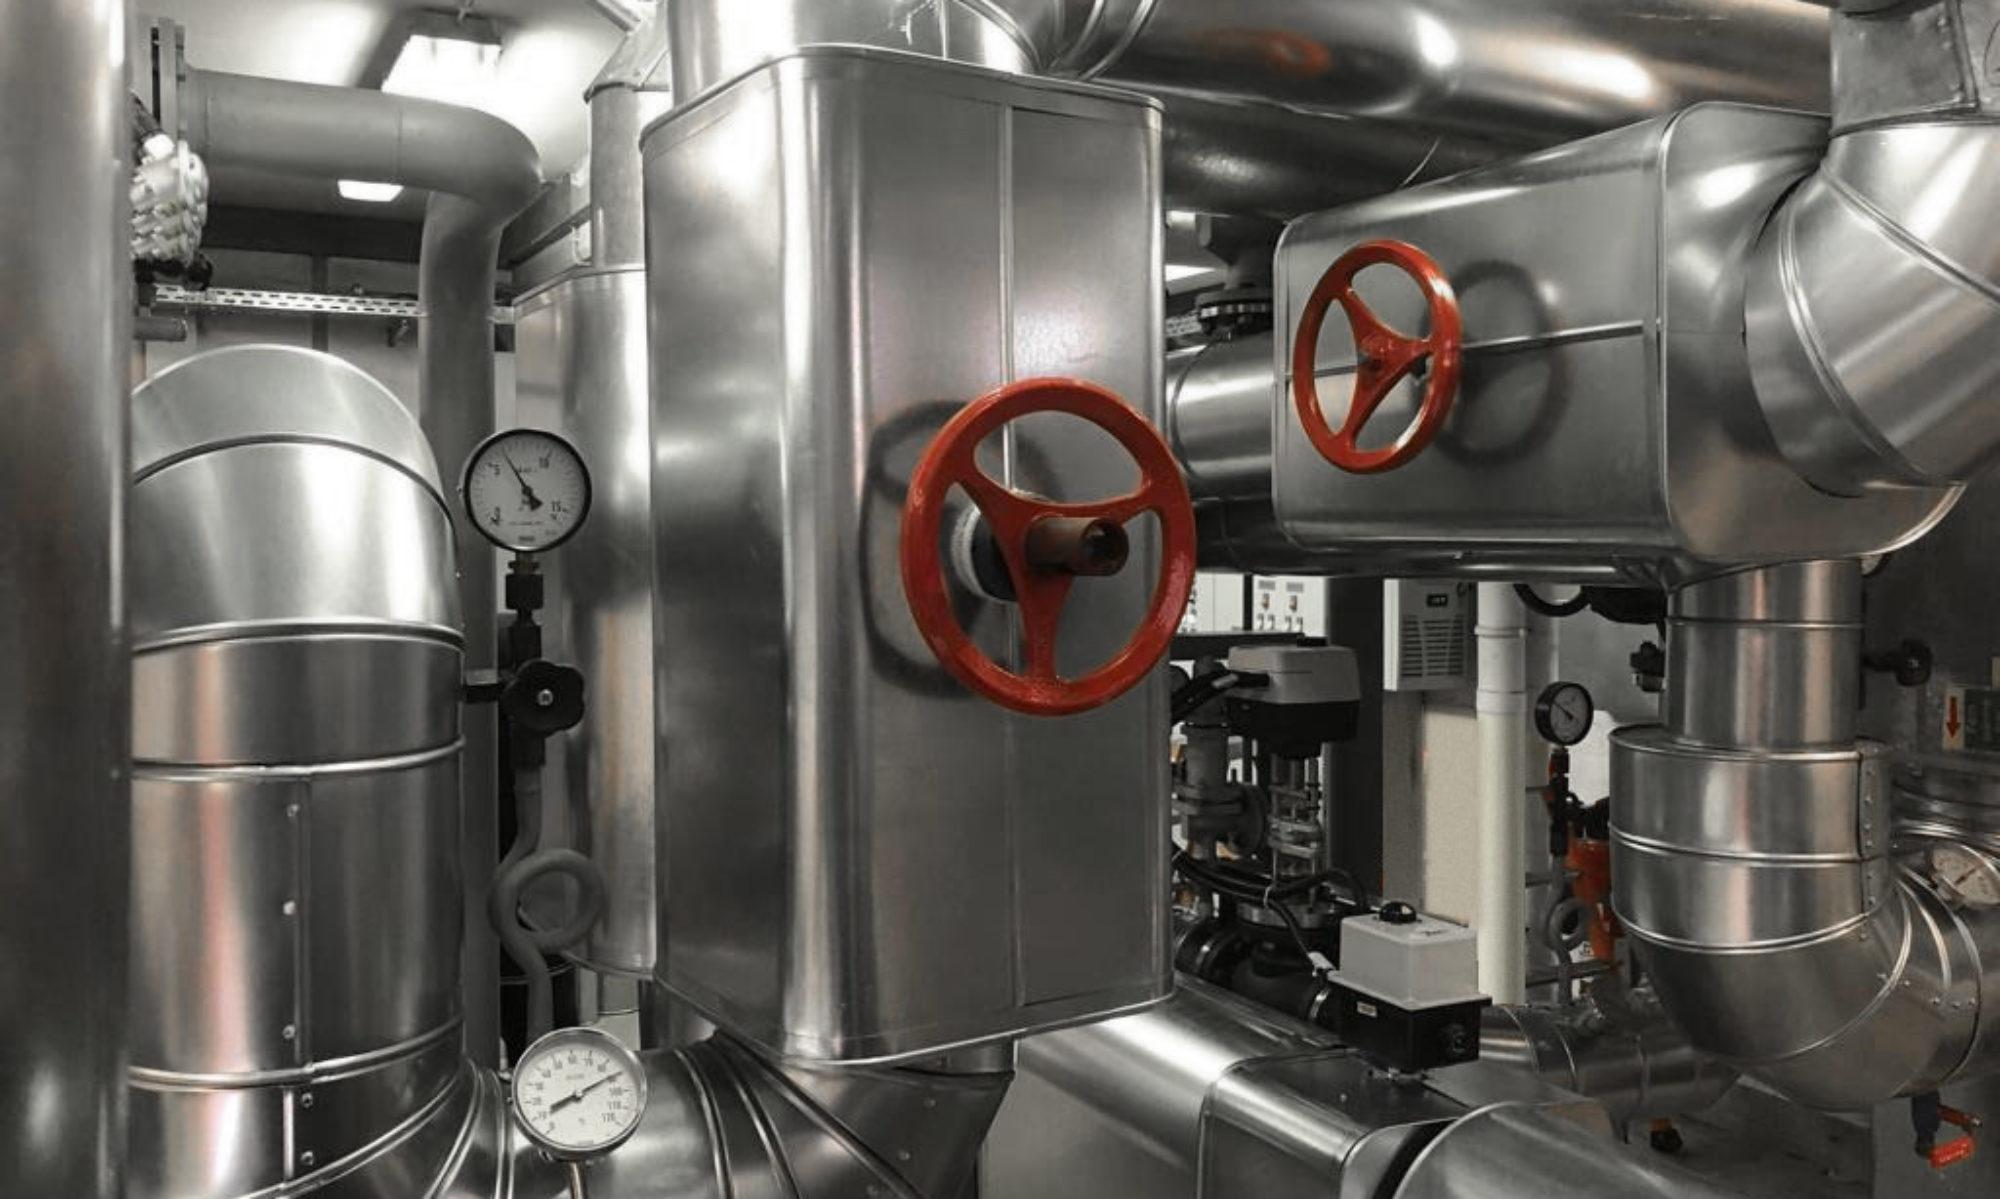 Wärme- Kälte- Schall & Brandschutz